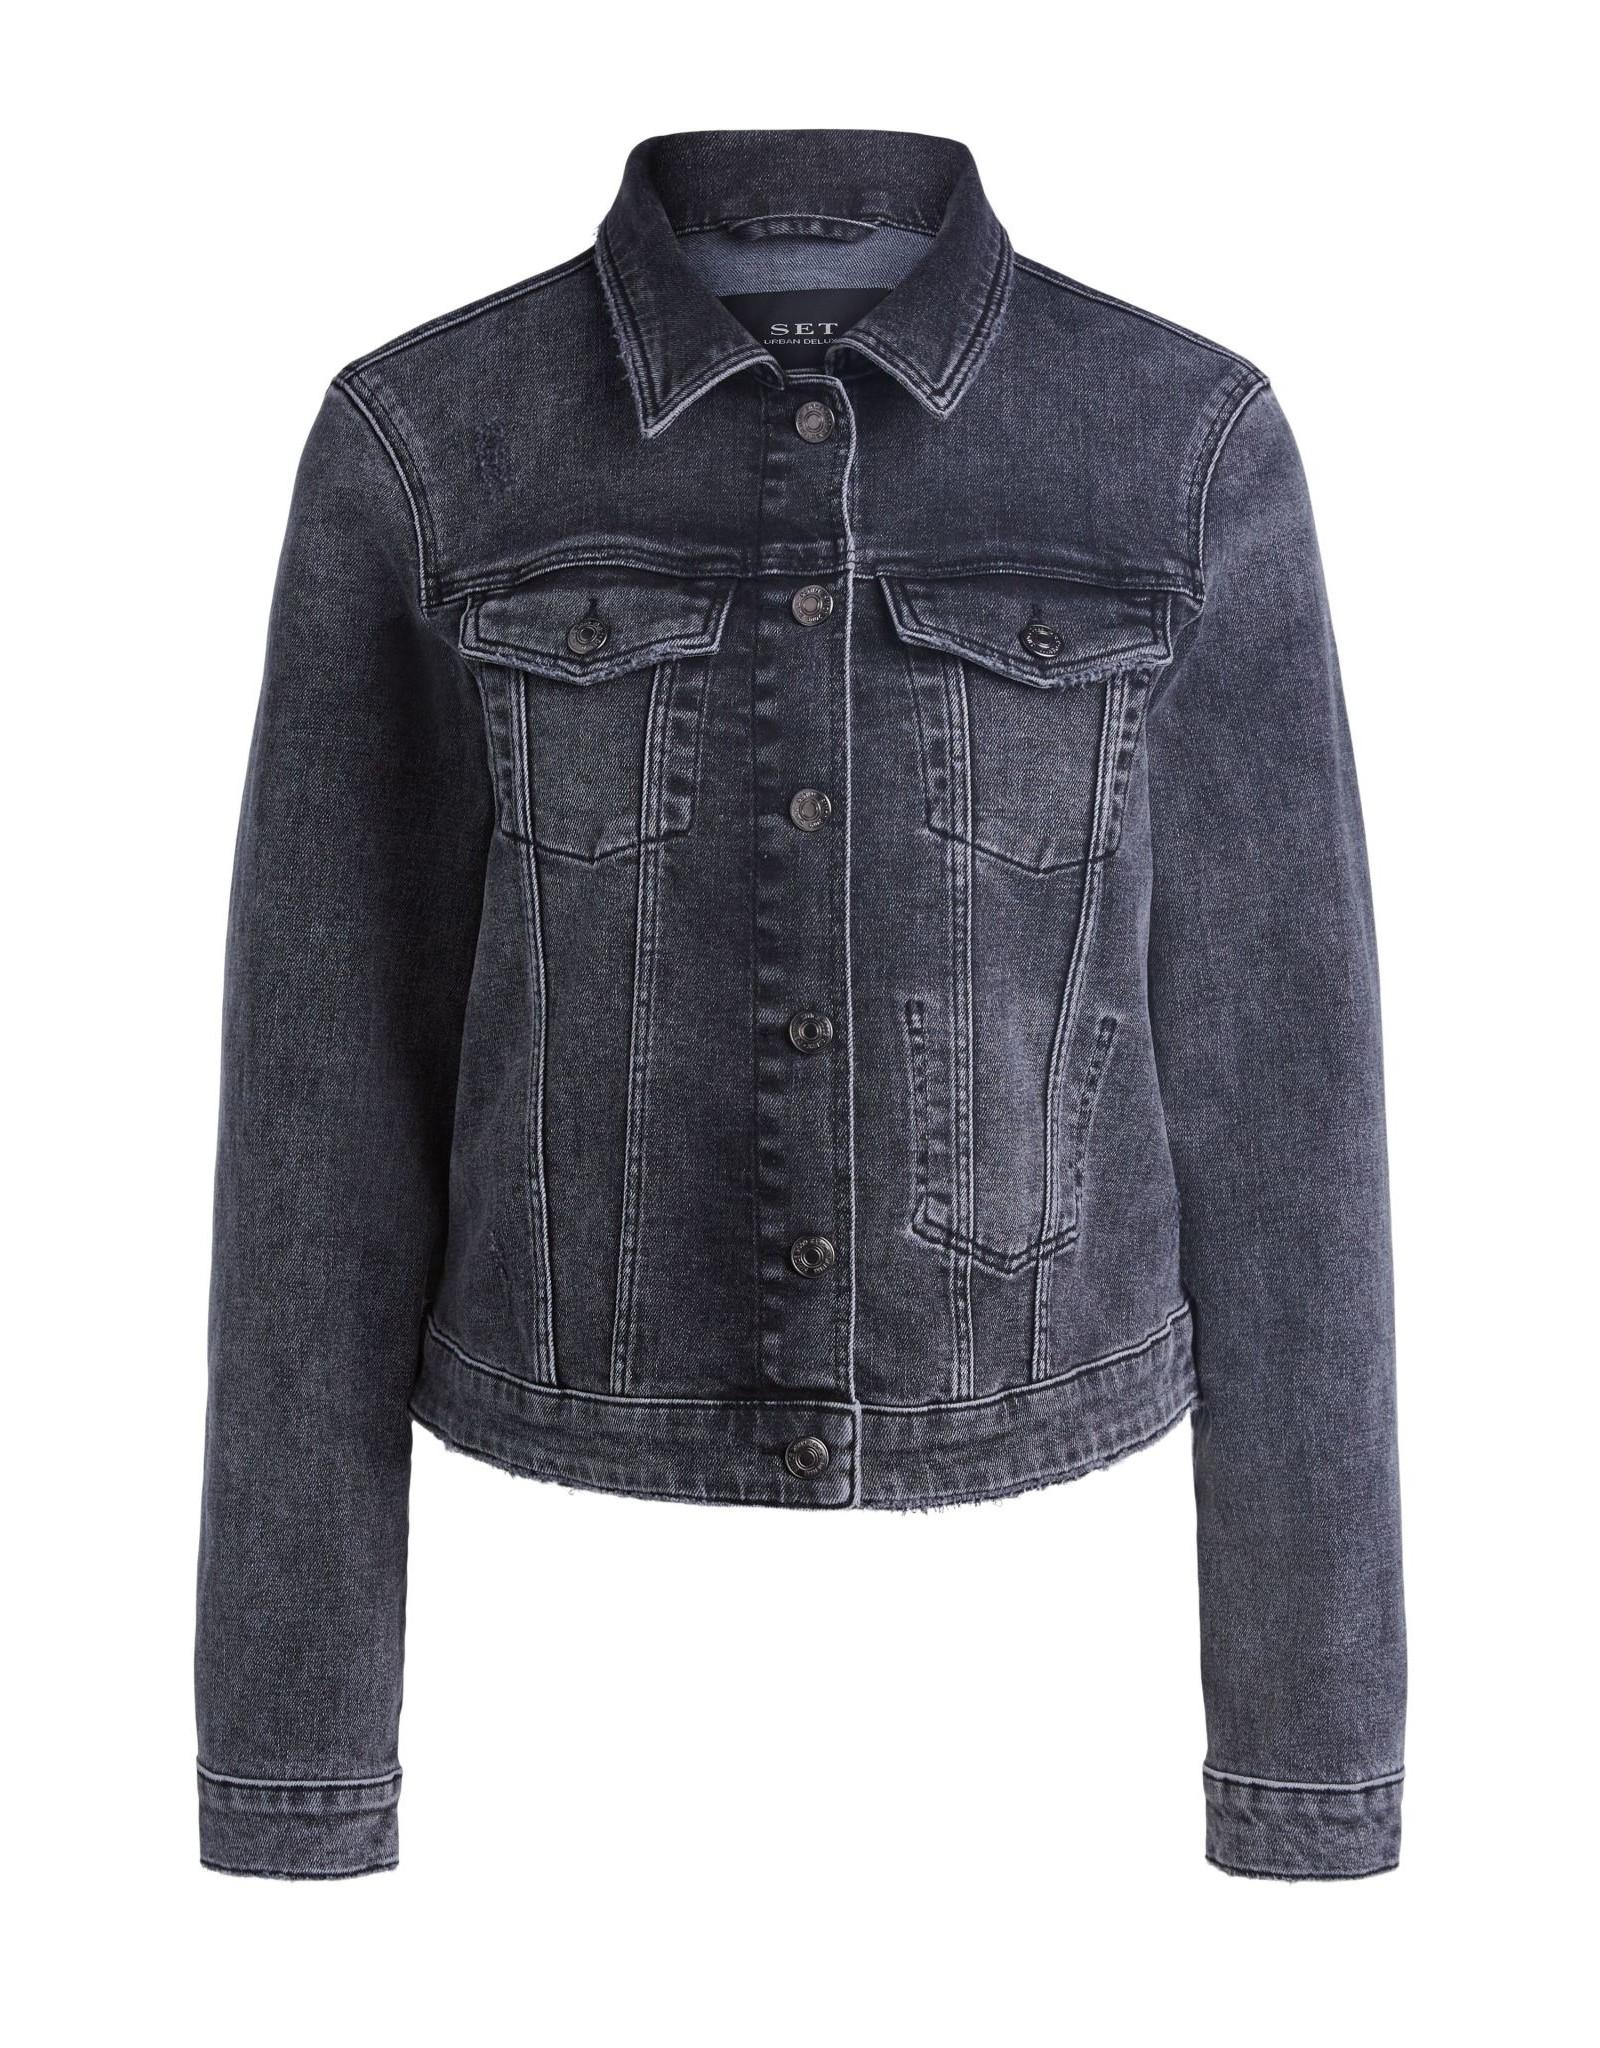 SET Dark grey denim jacket